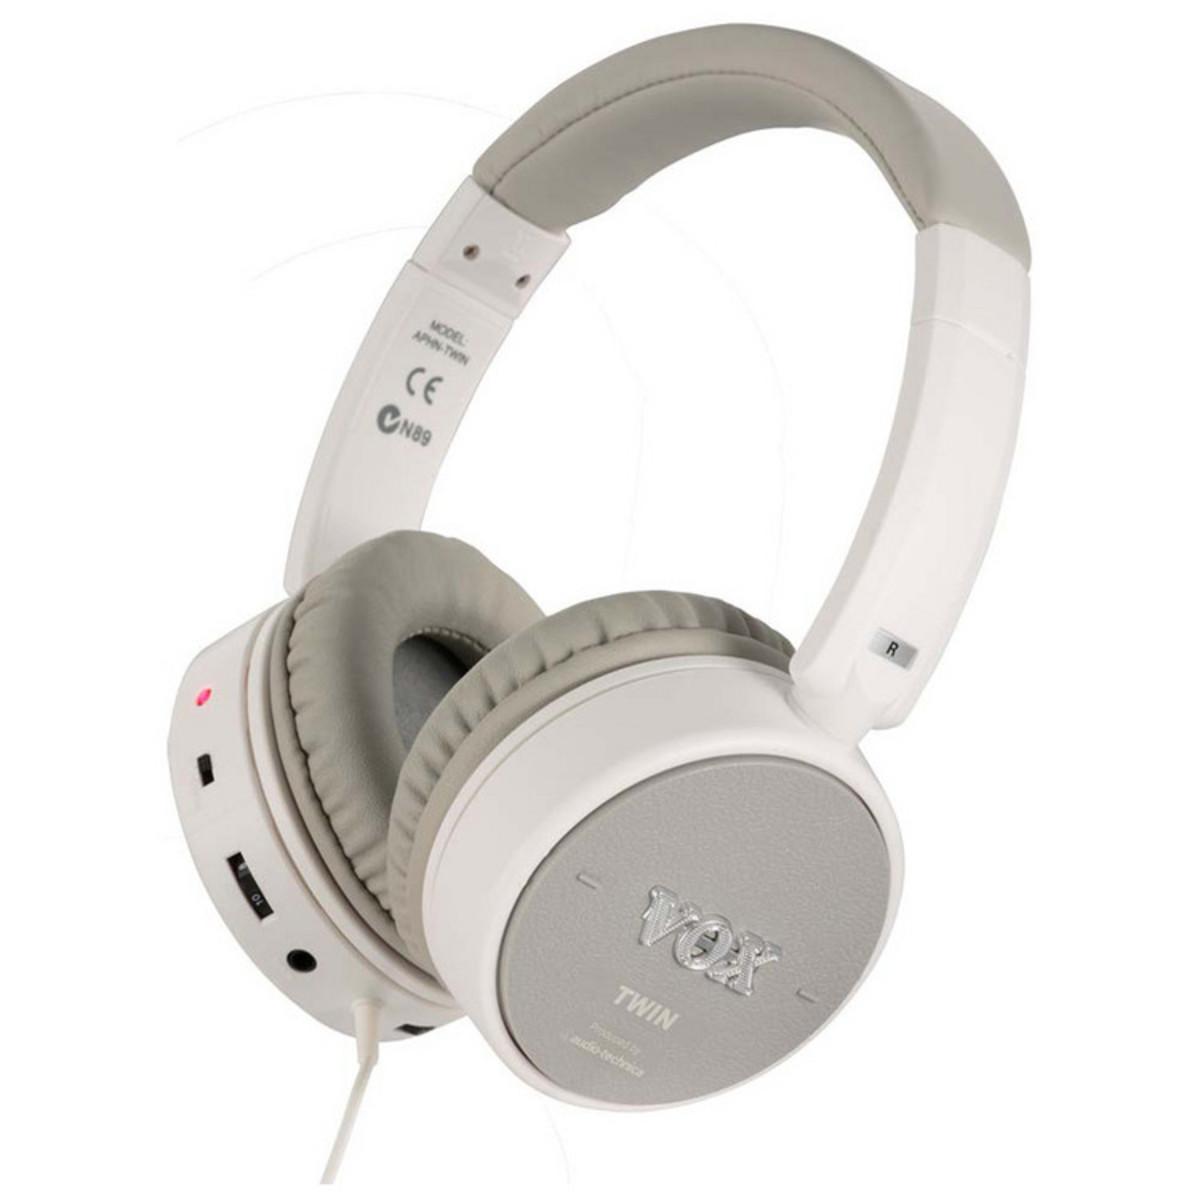 disc vox amphones active twin guitar headphones at gear4music. Black Bedroom Furniture Sets. Home Design Ideas